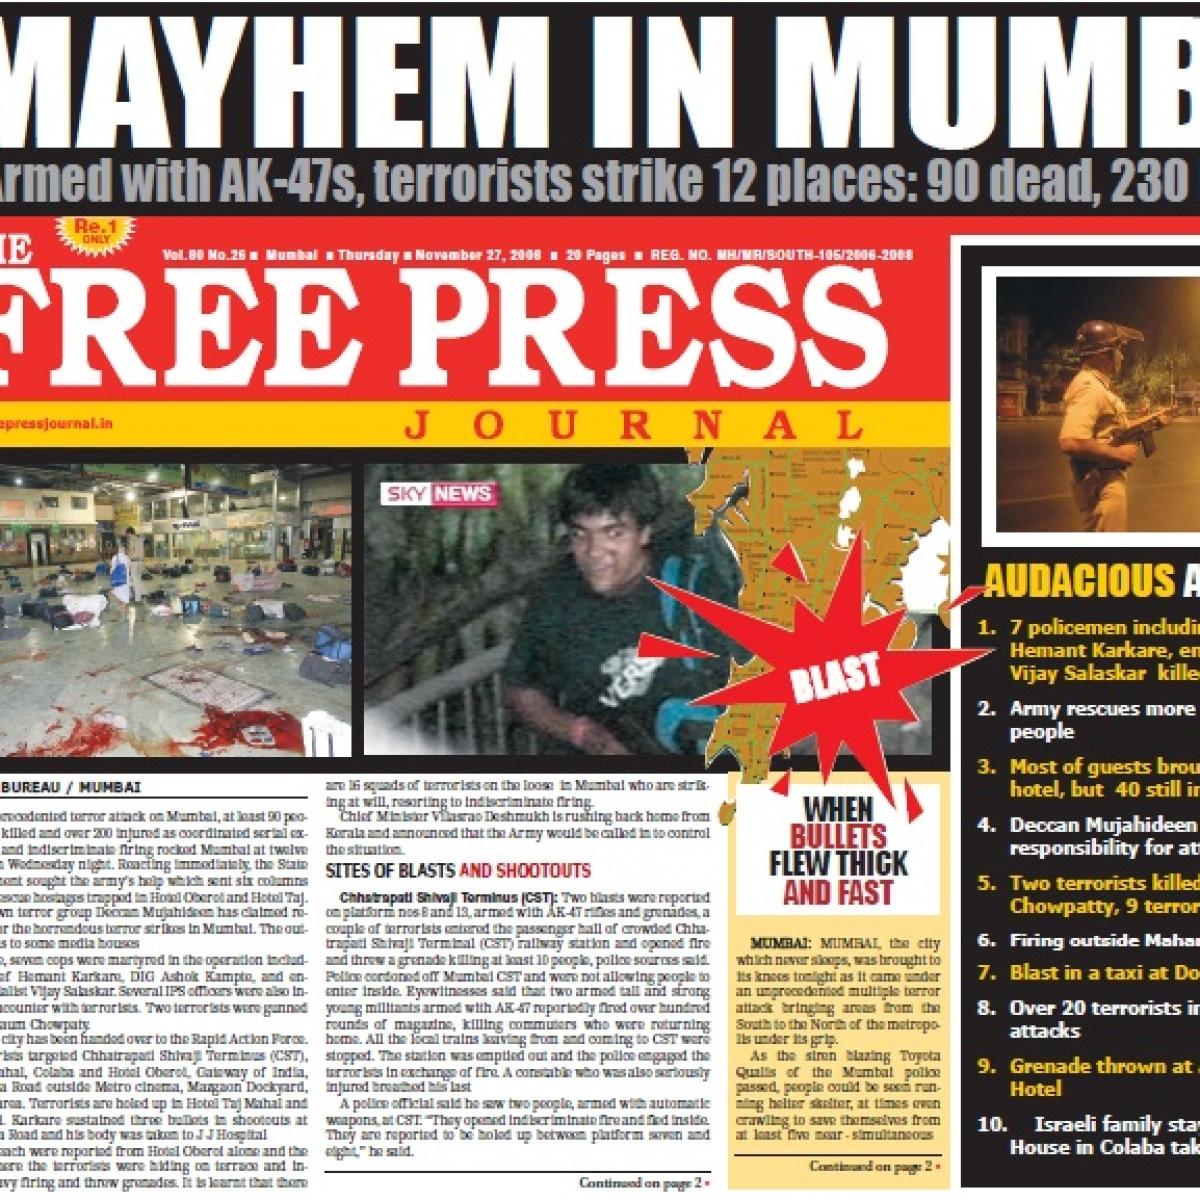 26/11 Terror Attacks: How The Free Press Journal covered Mumbai's Black Day